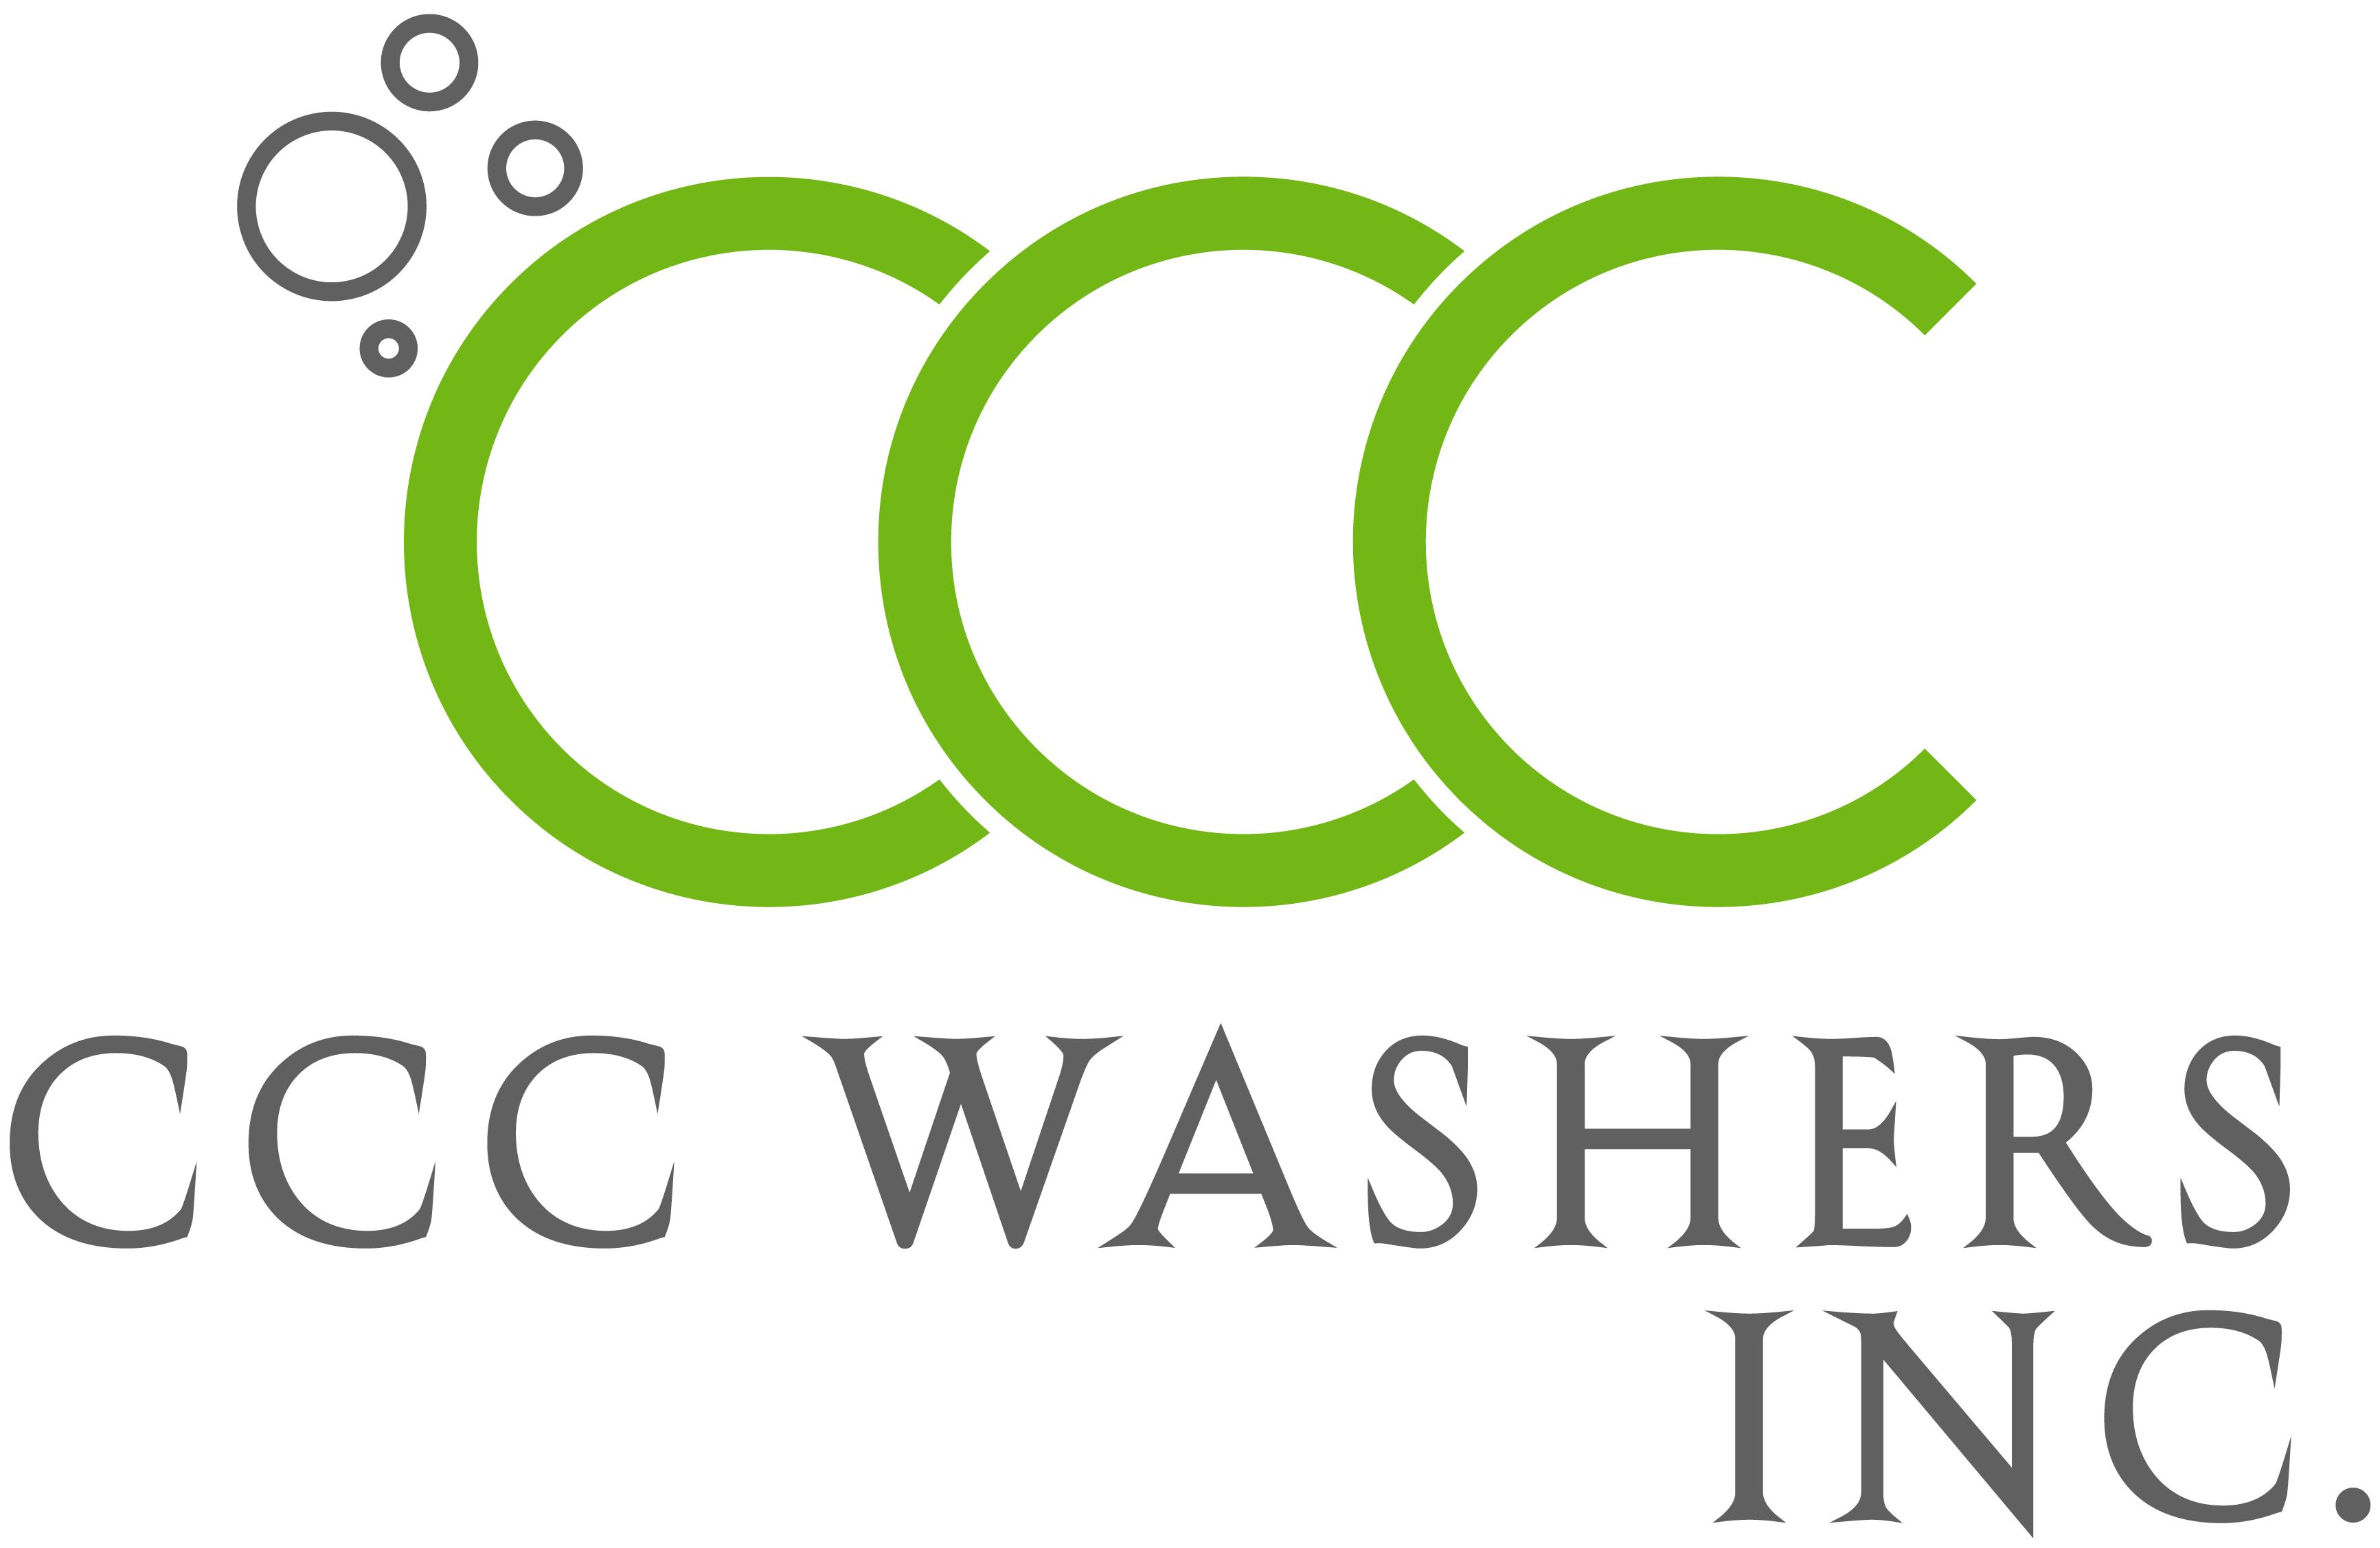 CCC Washers, Inc. & Charnecke Tents, Inc.